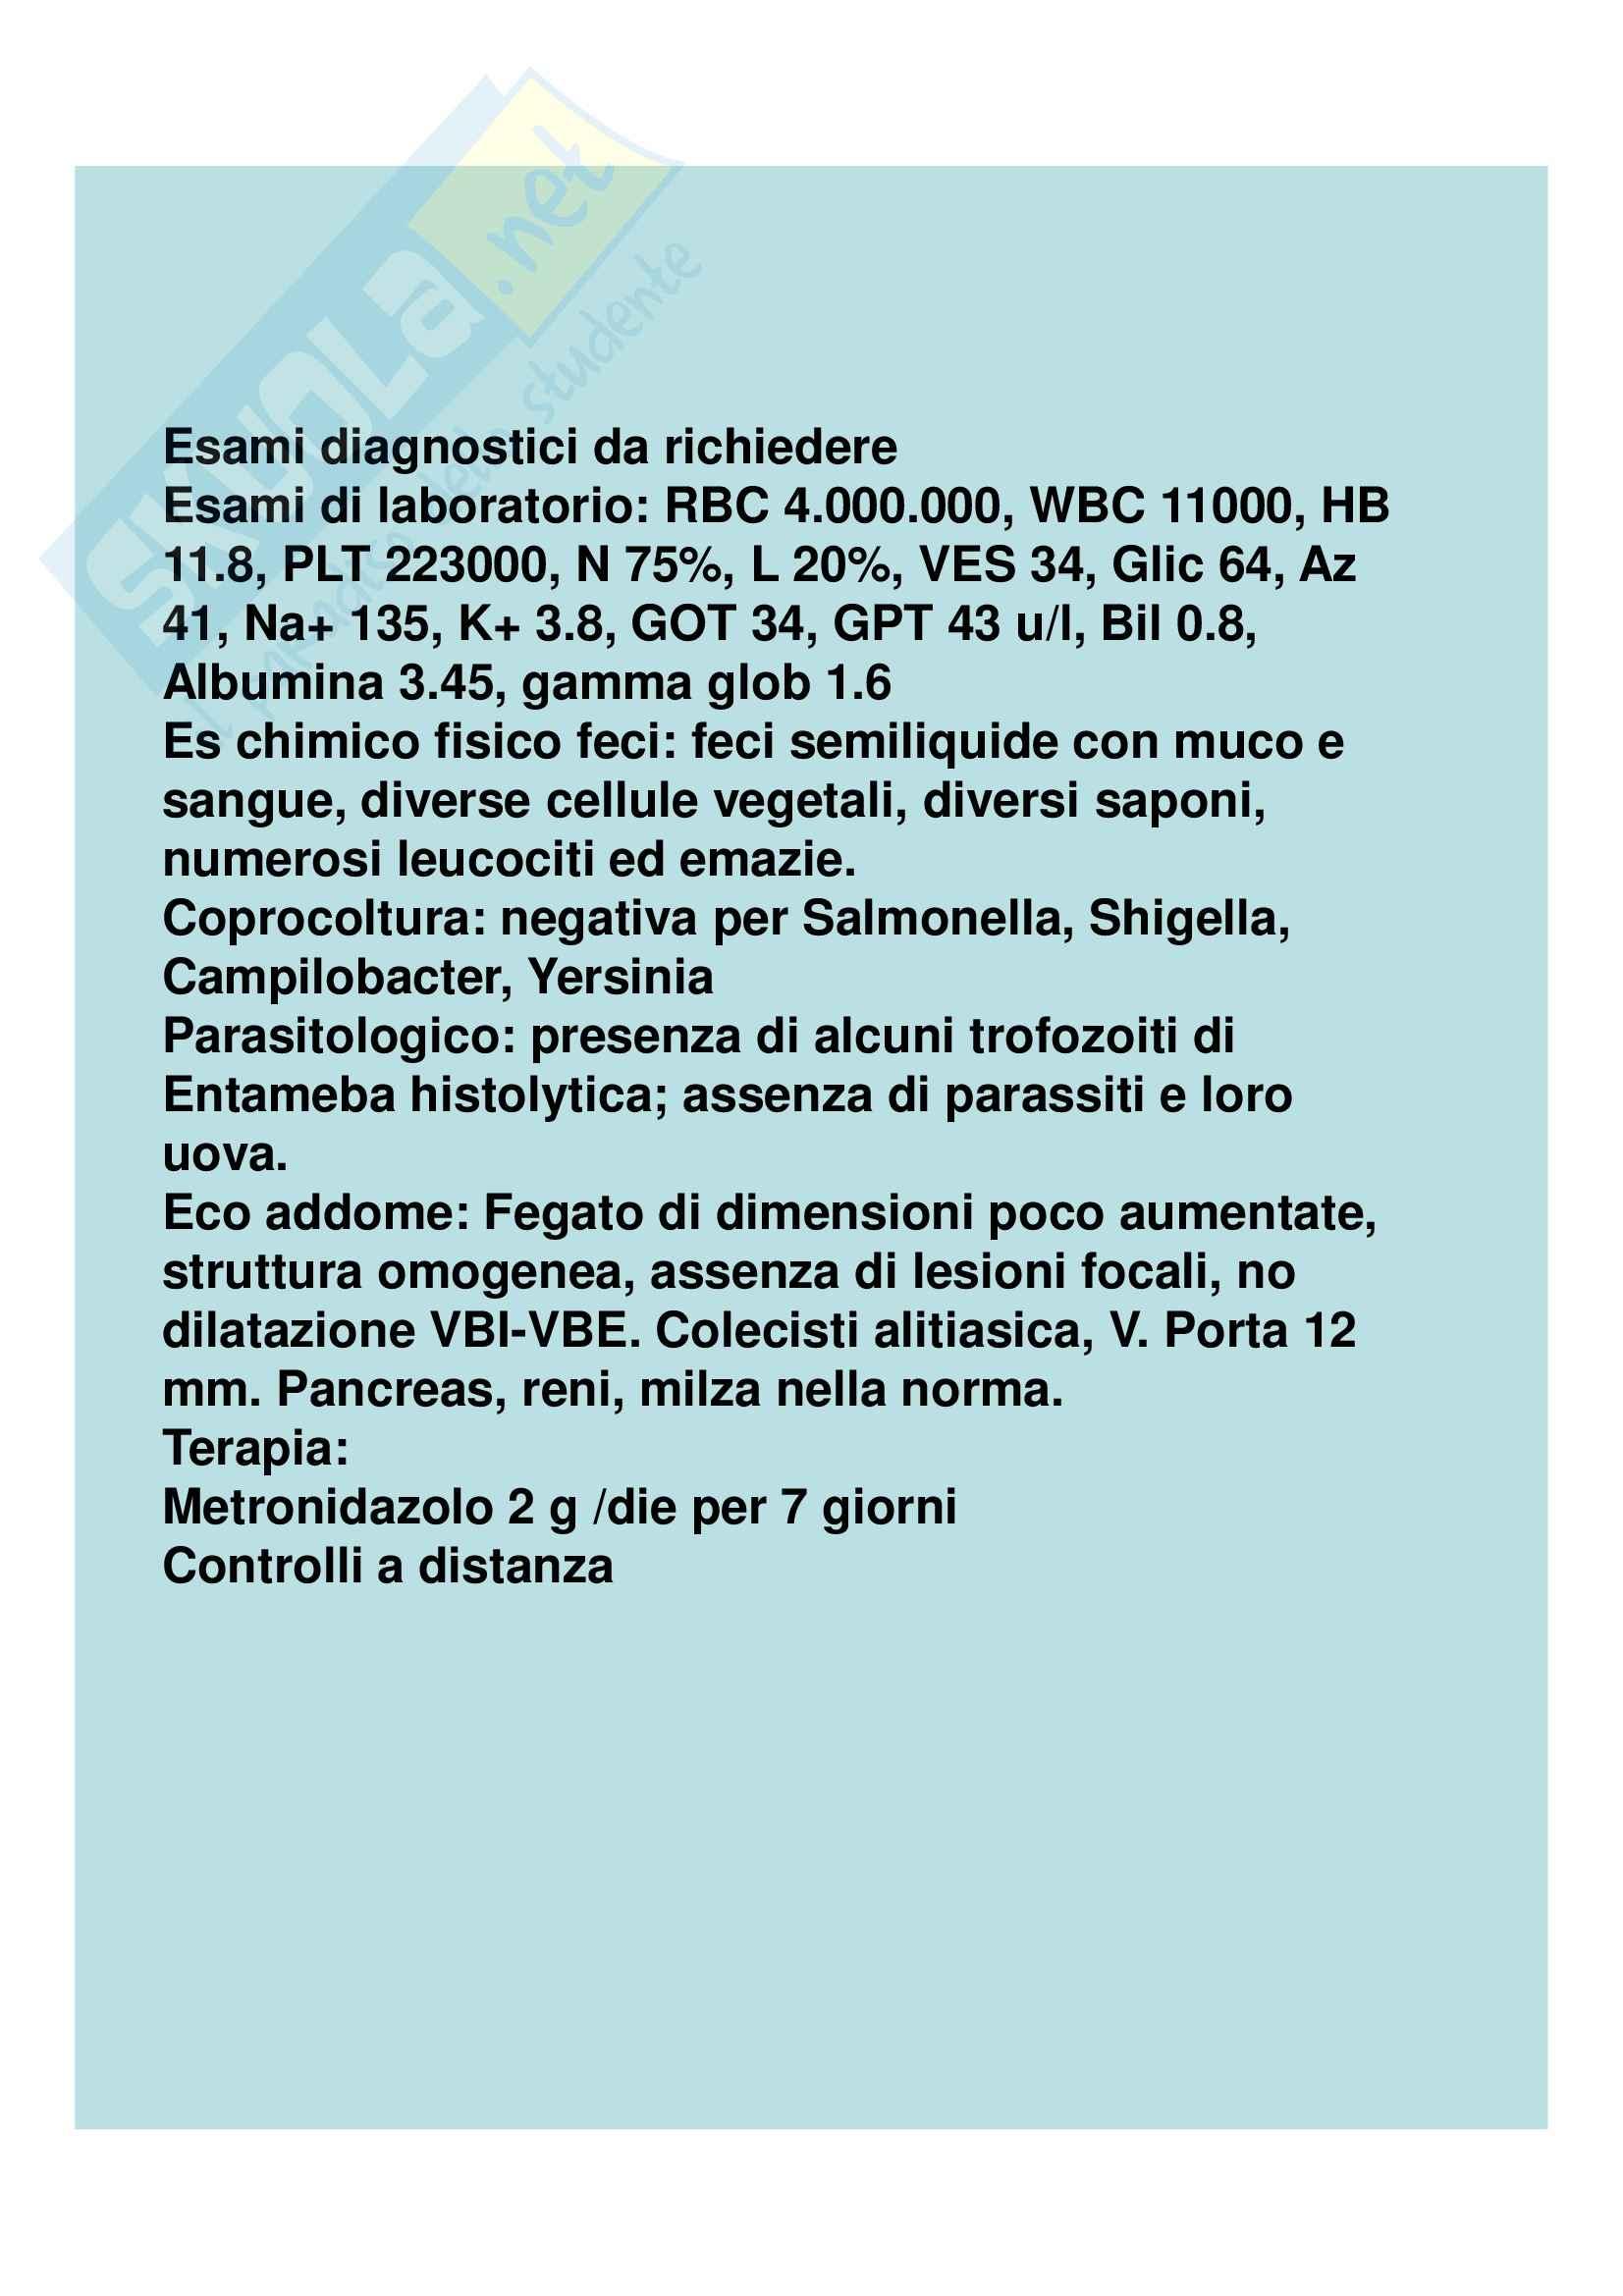 Medicina interna - diarrea cronica Pag. 36